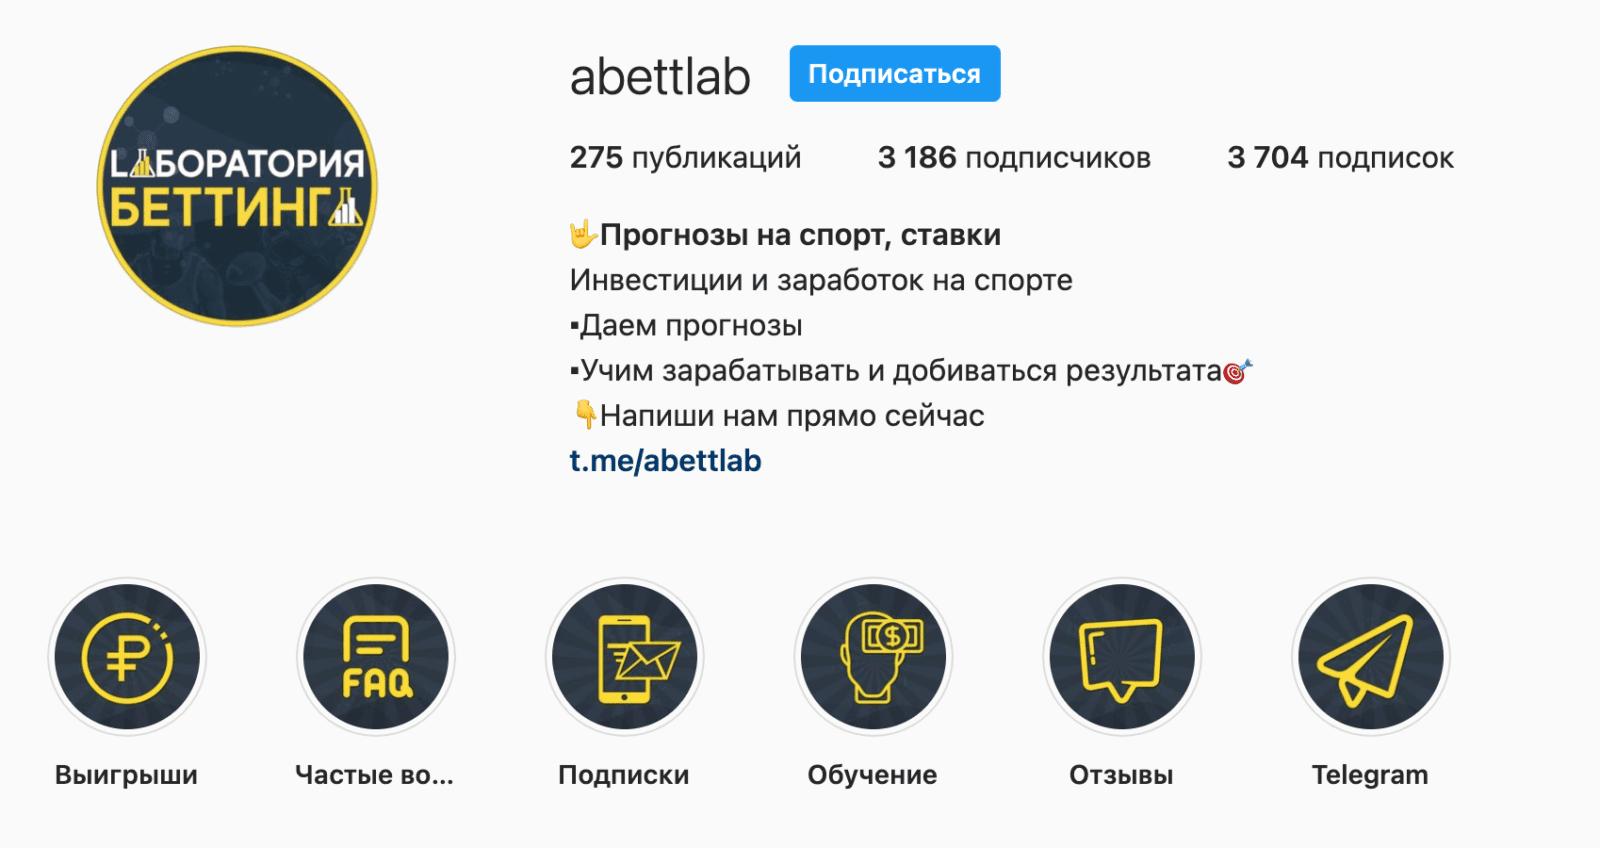 Инстаграм A-Bettlab (Бетлаб) | Лаборатория Беттинга